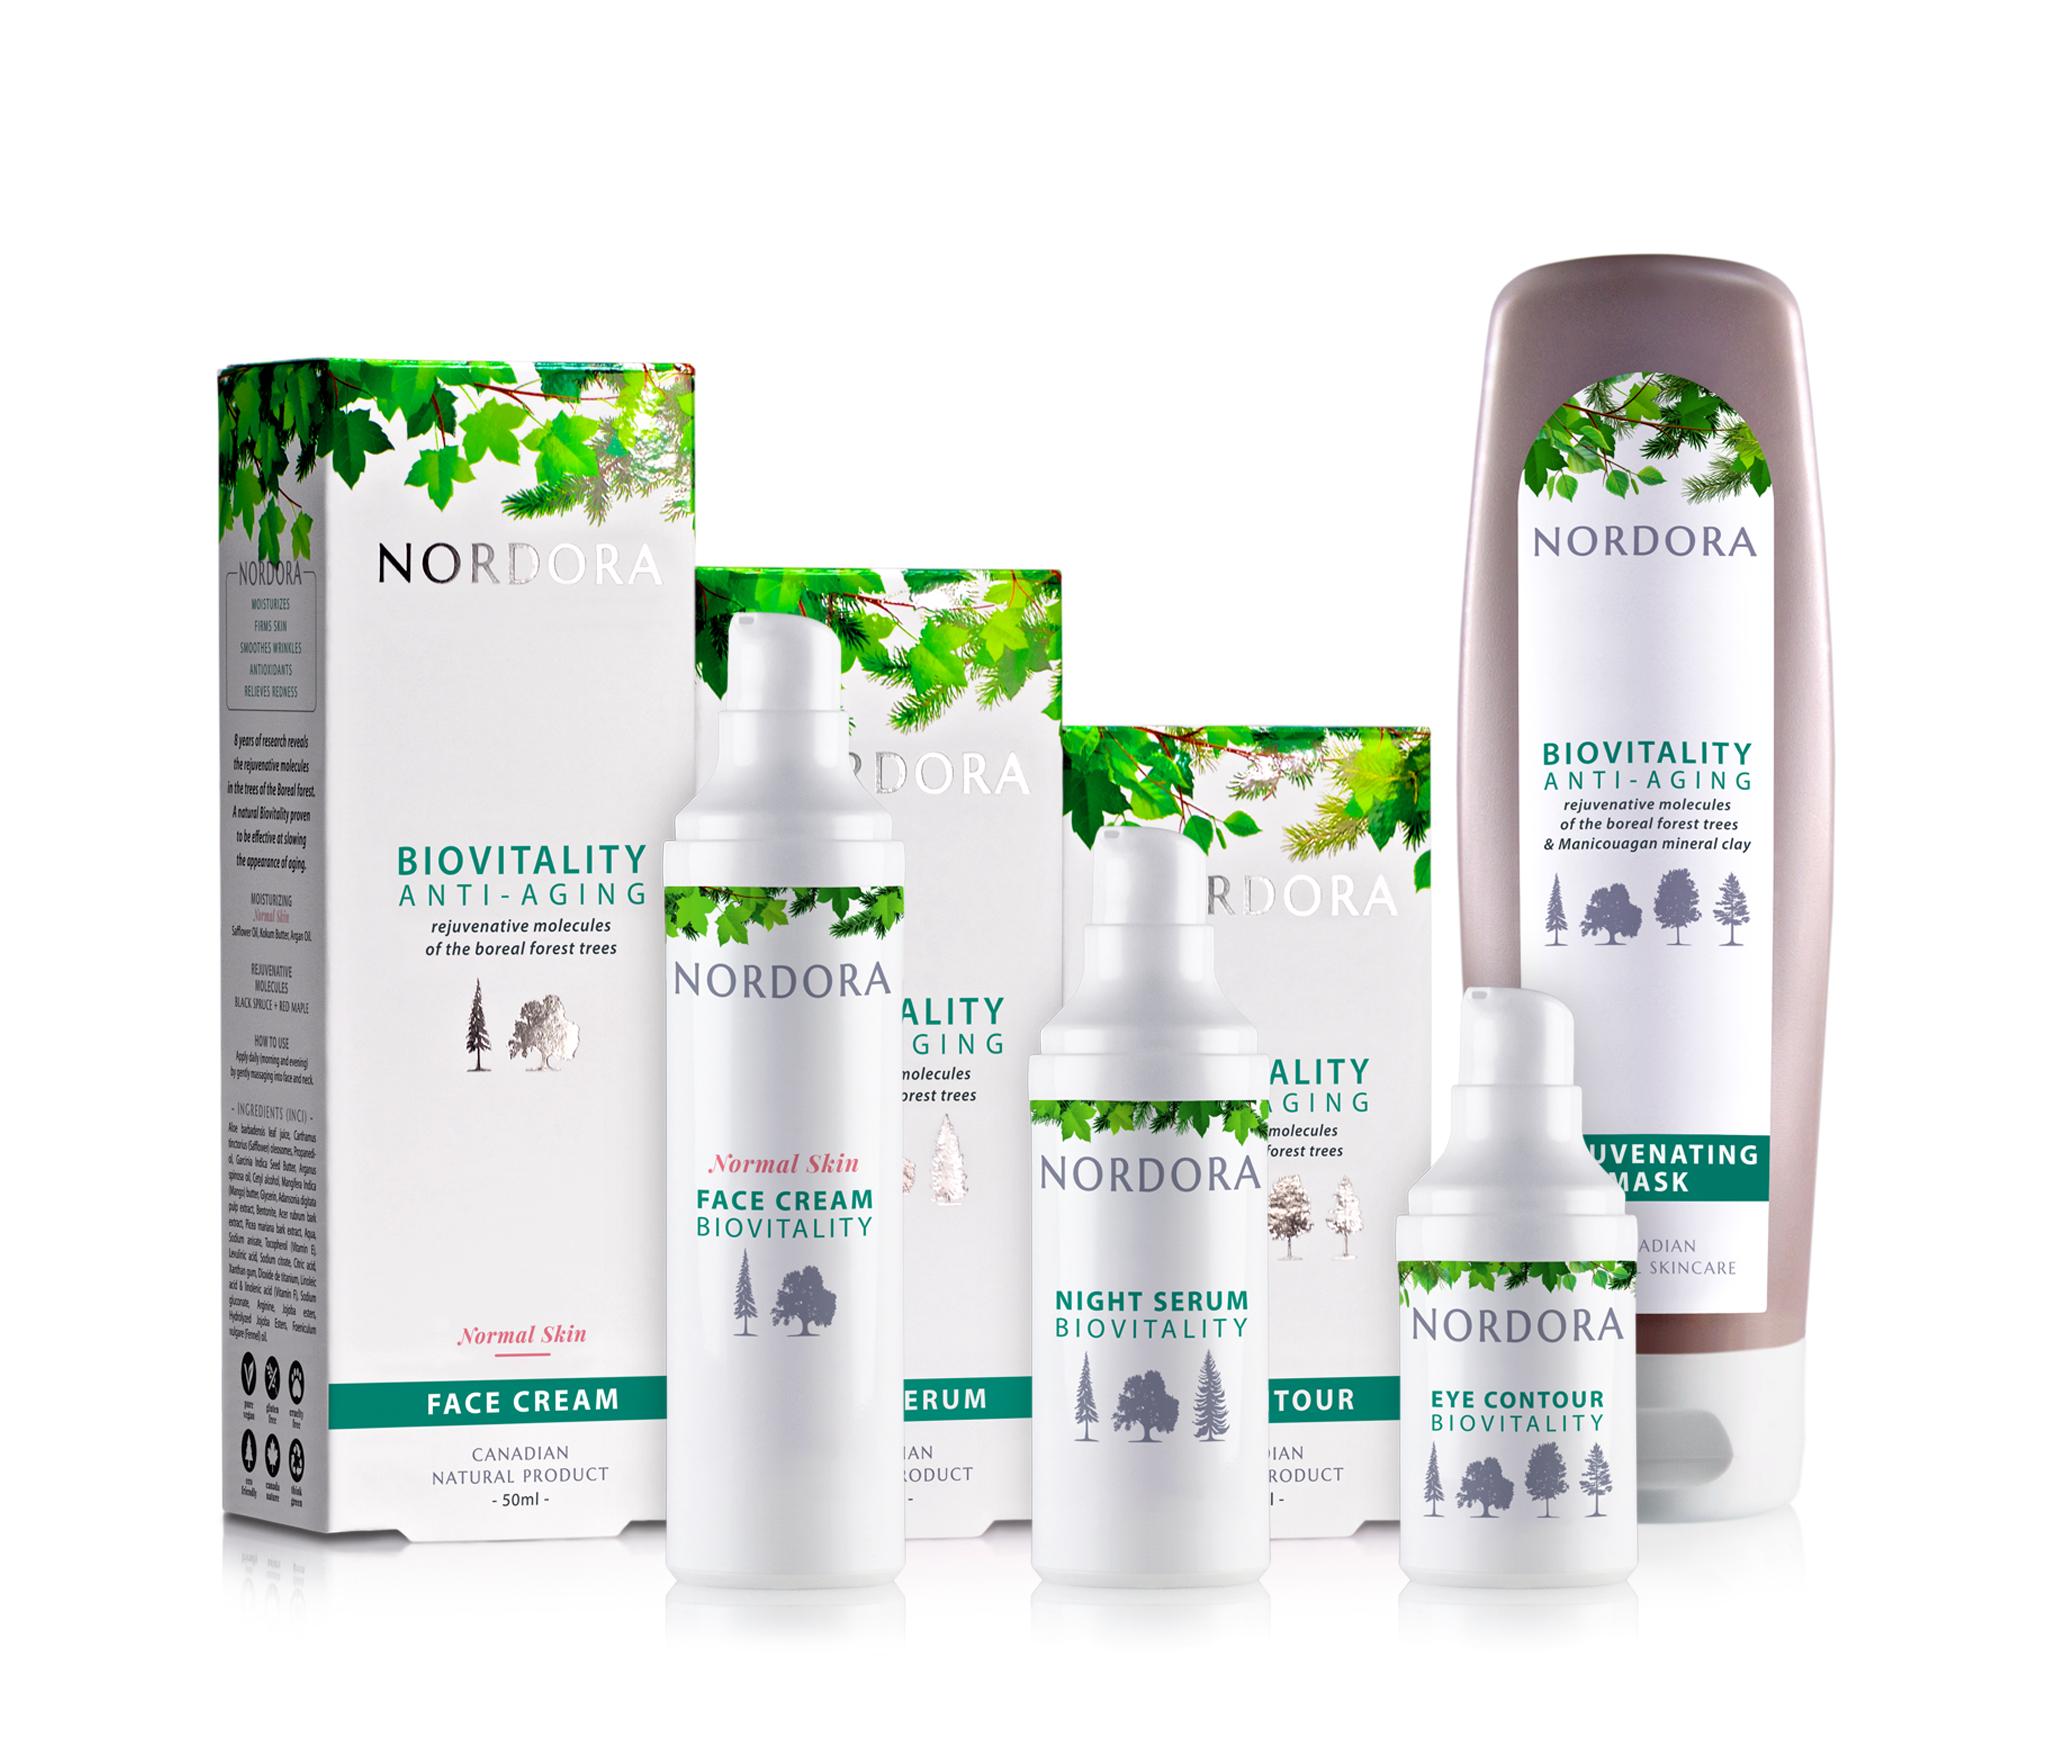 Nordora_BioVitality_Line_EN.jpg